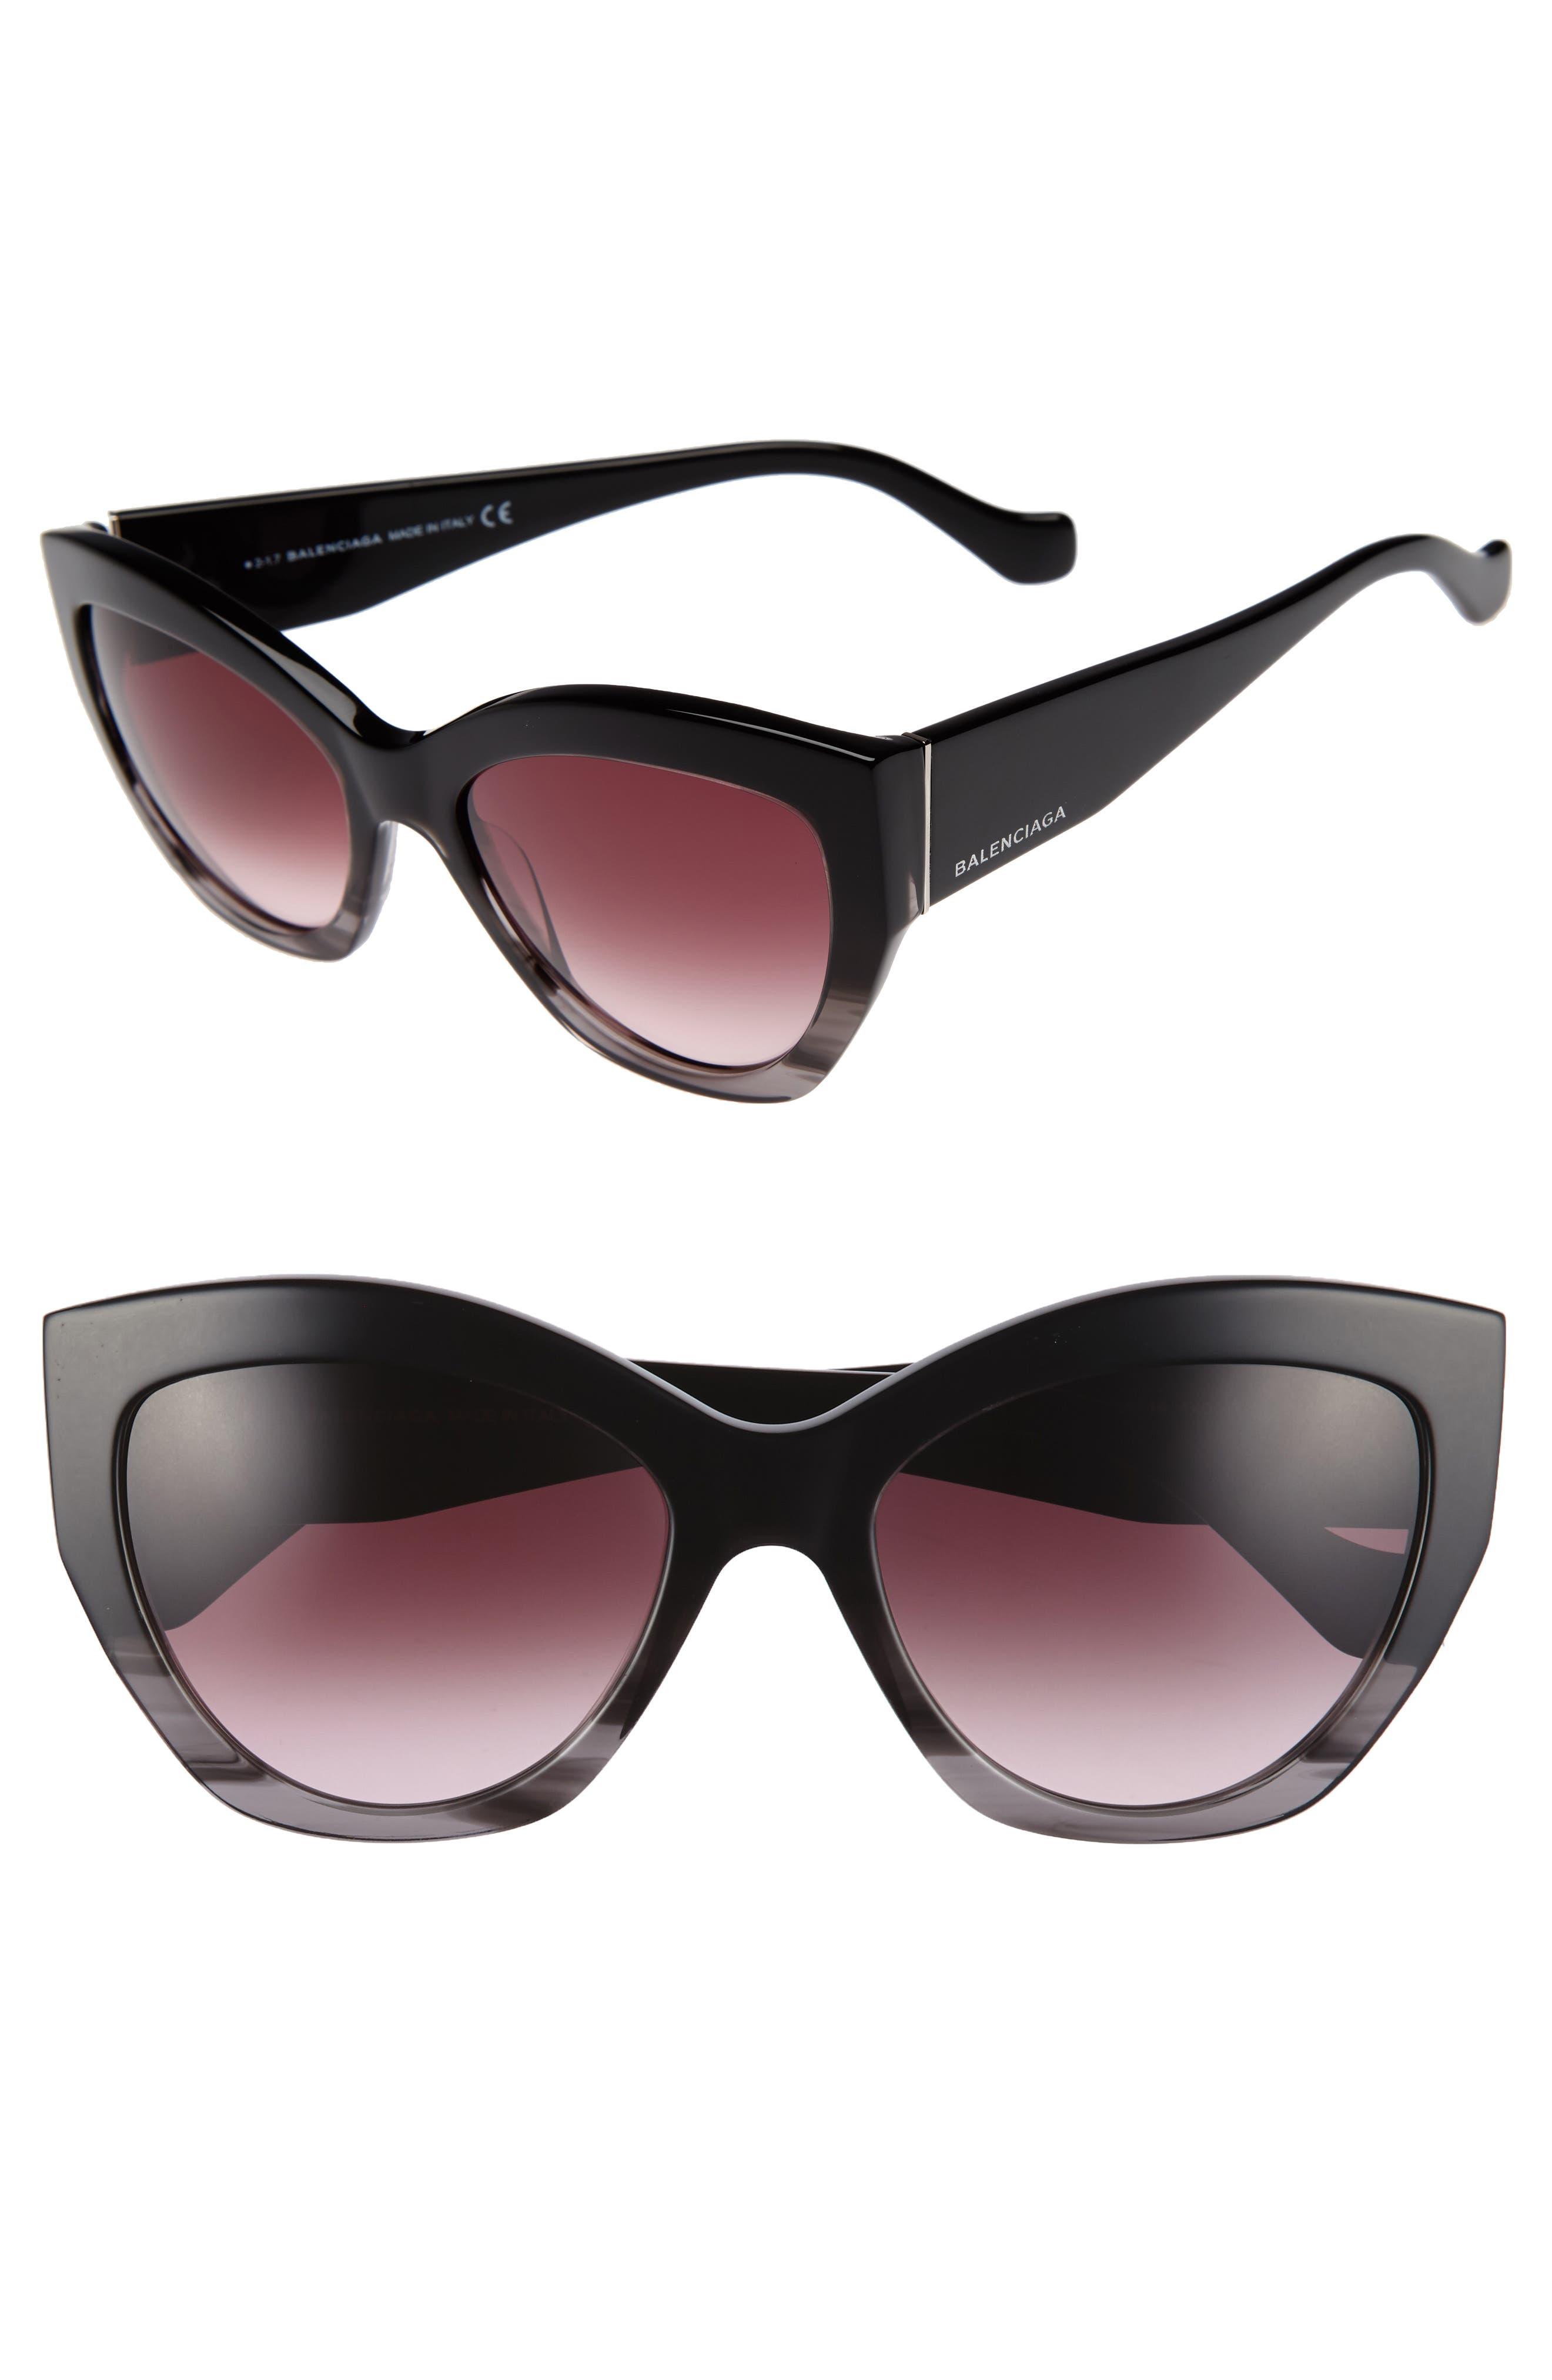 56mm Cat Eye Sunglasses,                             Main thumbnail 1, color,                             Striped Black/ Opal/ Ruthenium